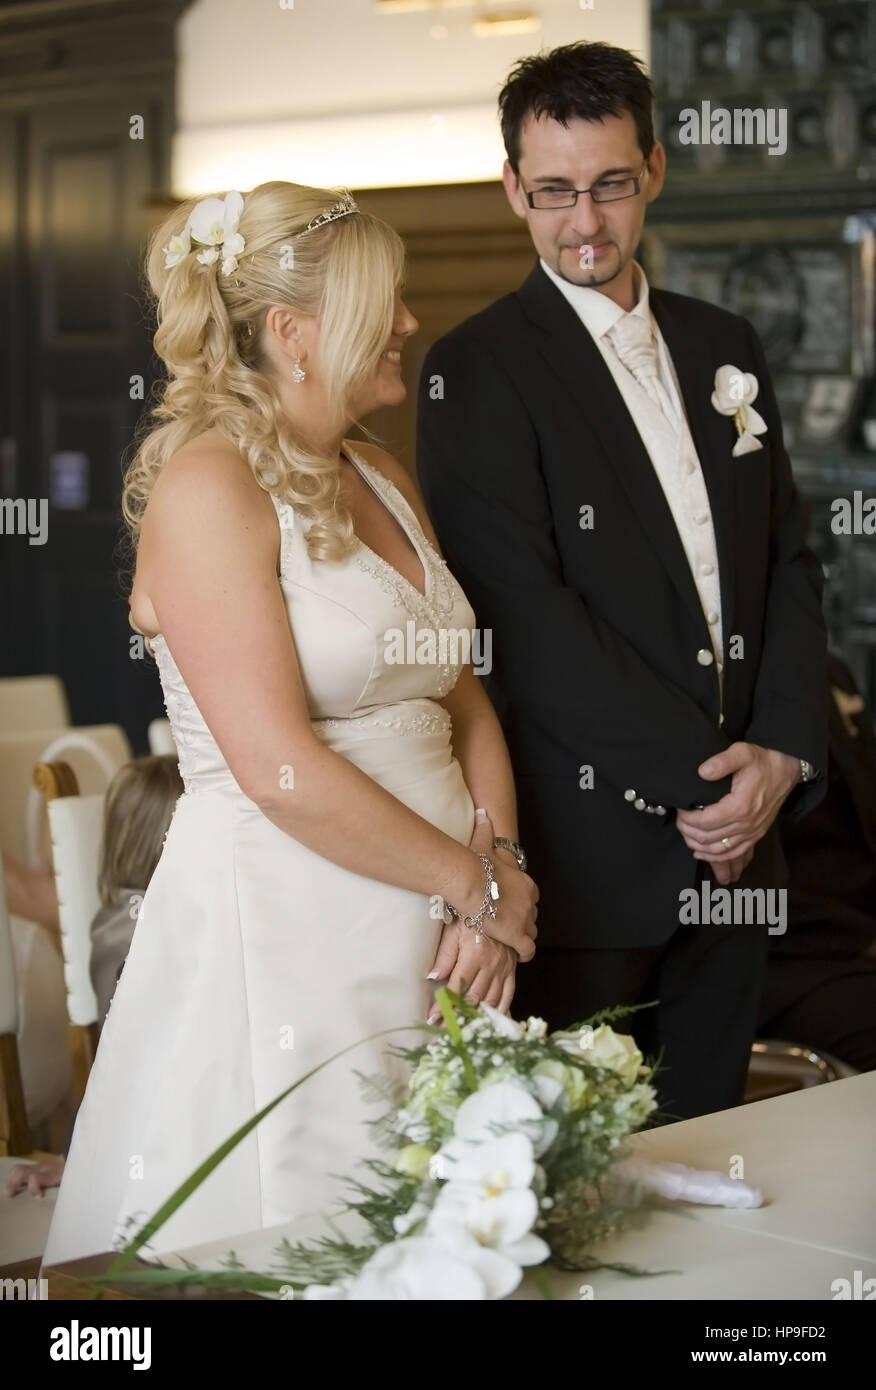 Model released , Standesamtliche Hochzeit - married in a civil ceremony - Stock Image